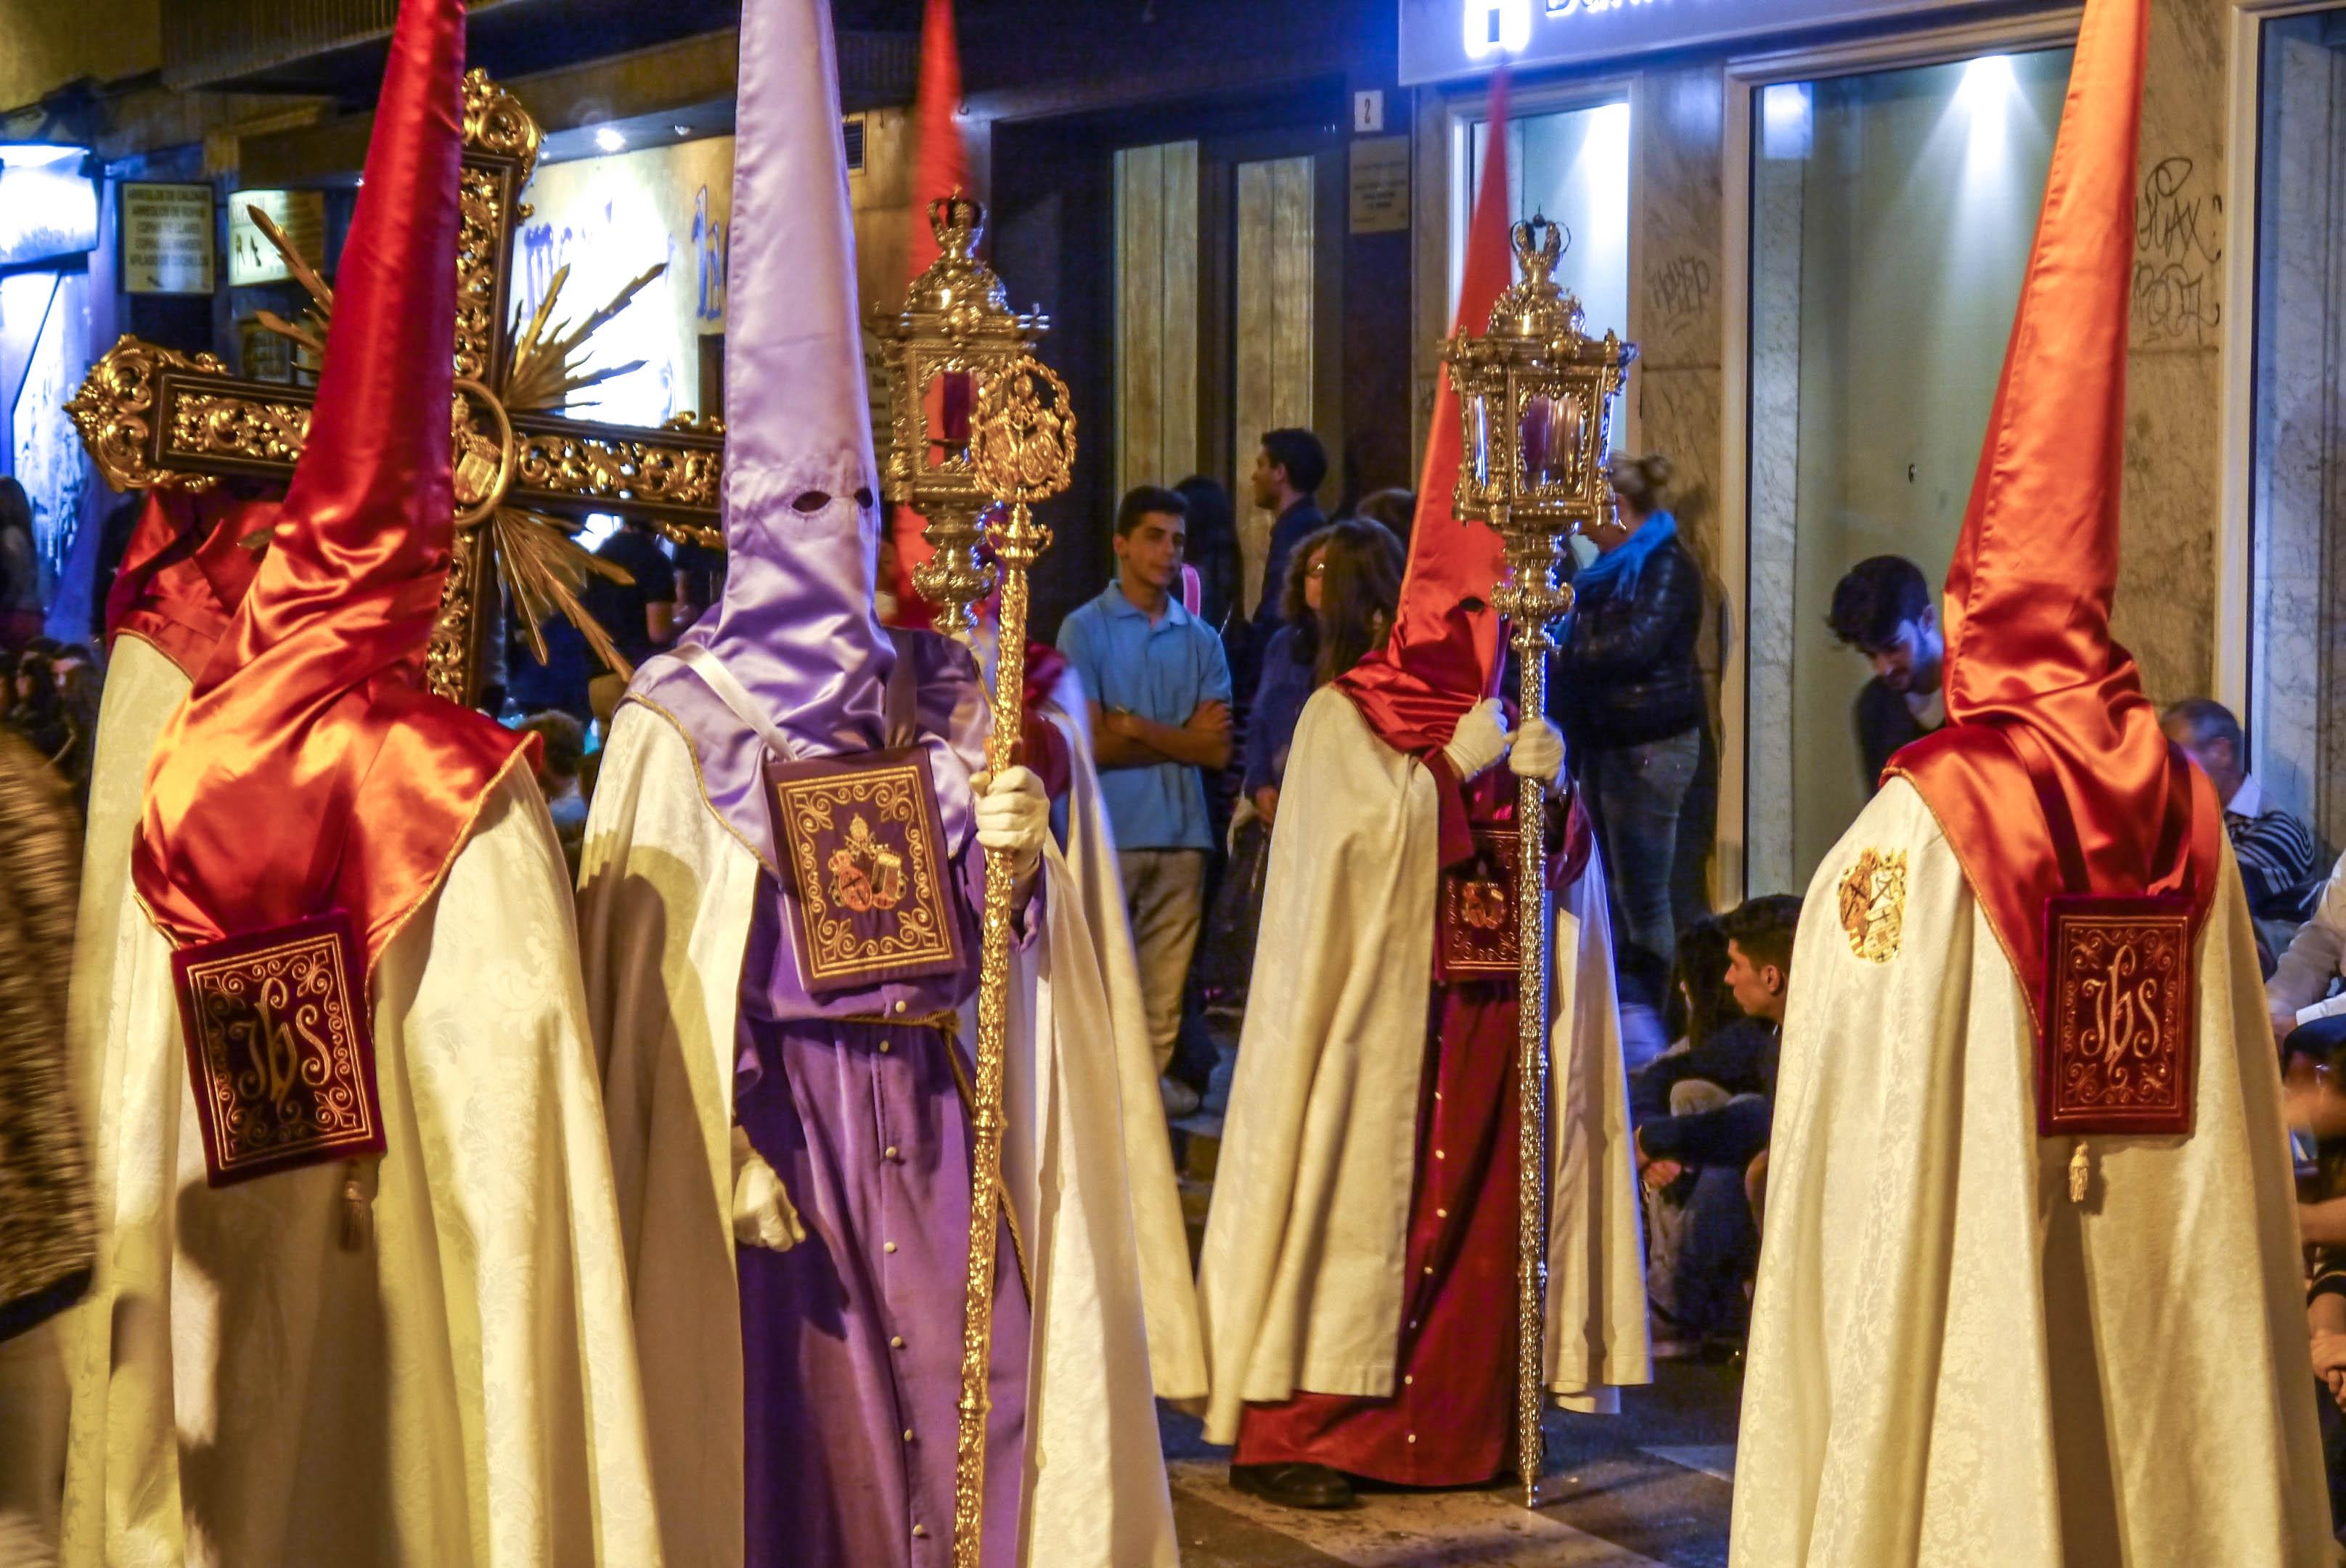 Semana Santa – Wielkanoc w Andaluzji